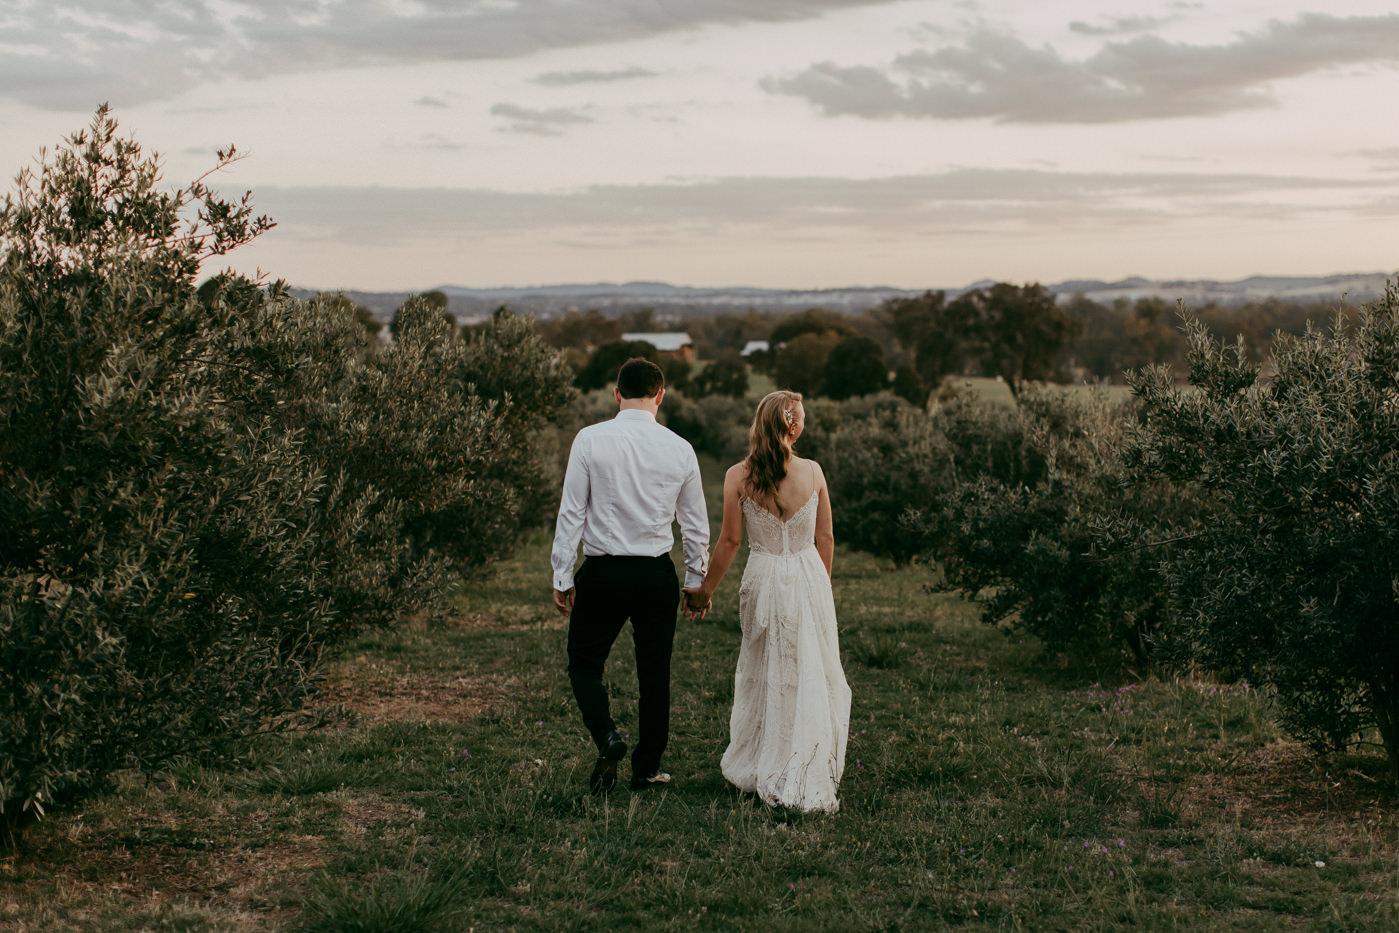 Anthony & Eliet - Wagga Wagga Wedding - Country NSW - Samantha Heather Photography-162.jpg